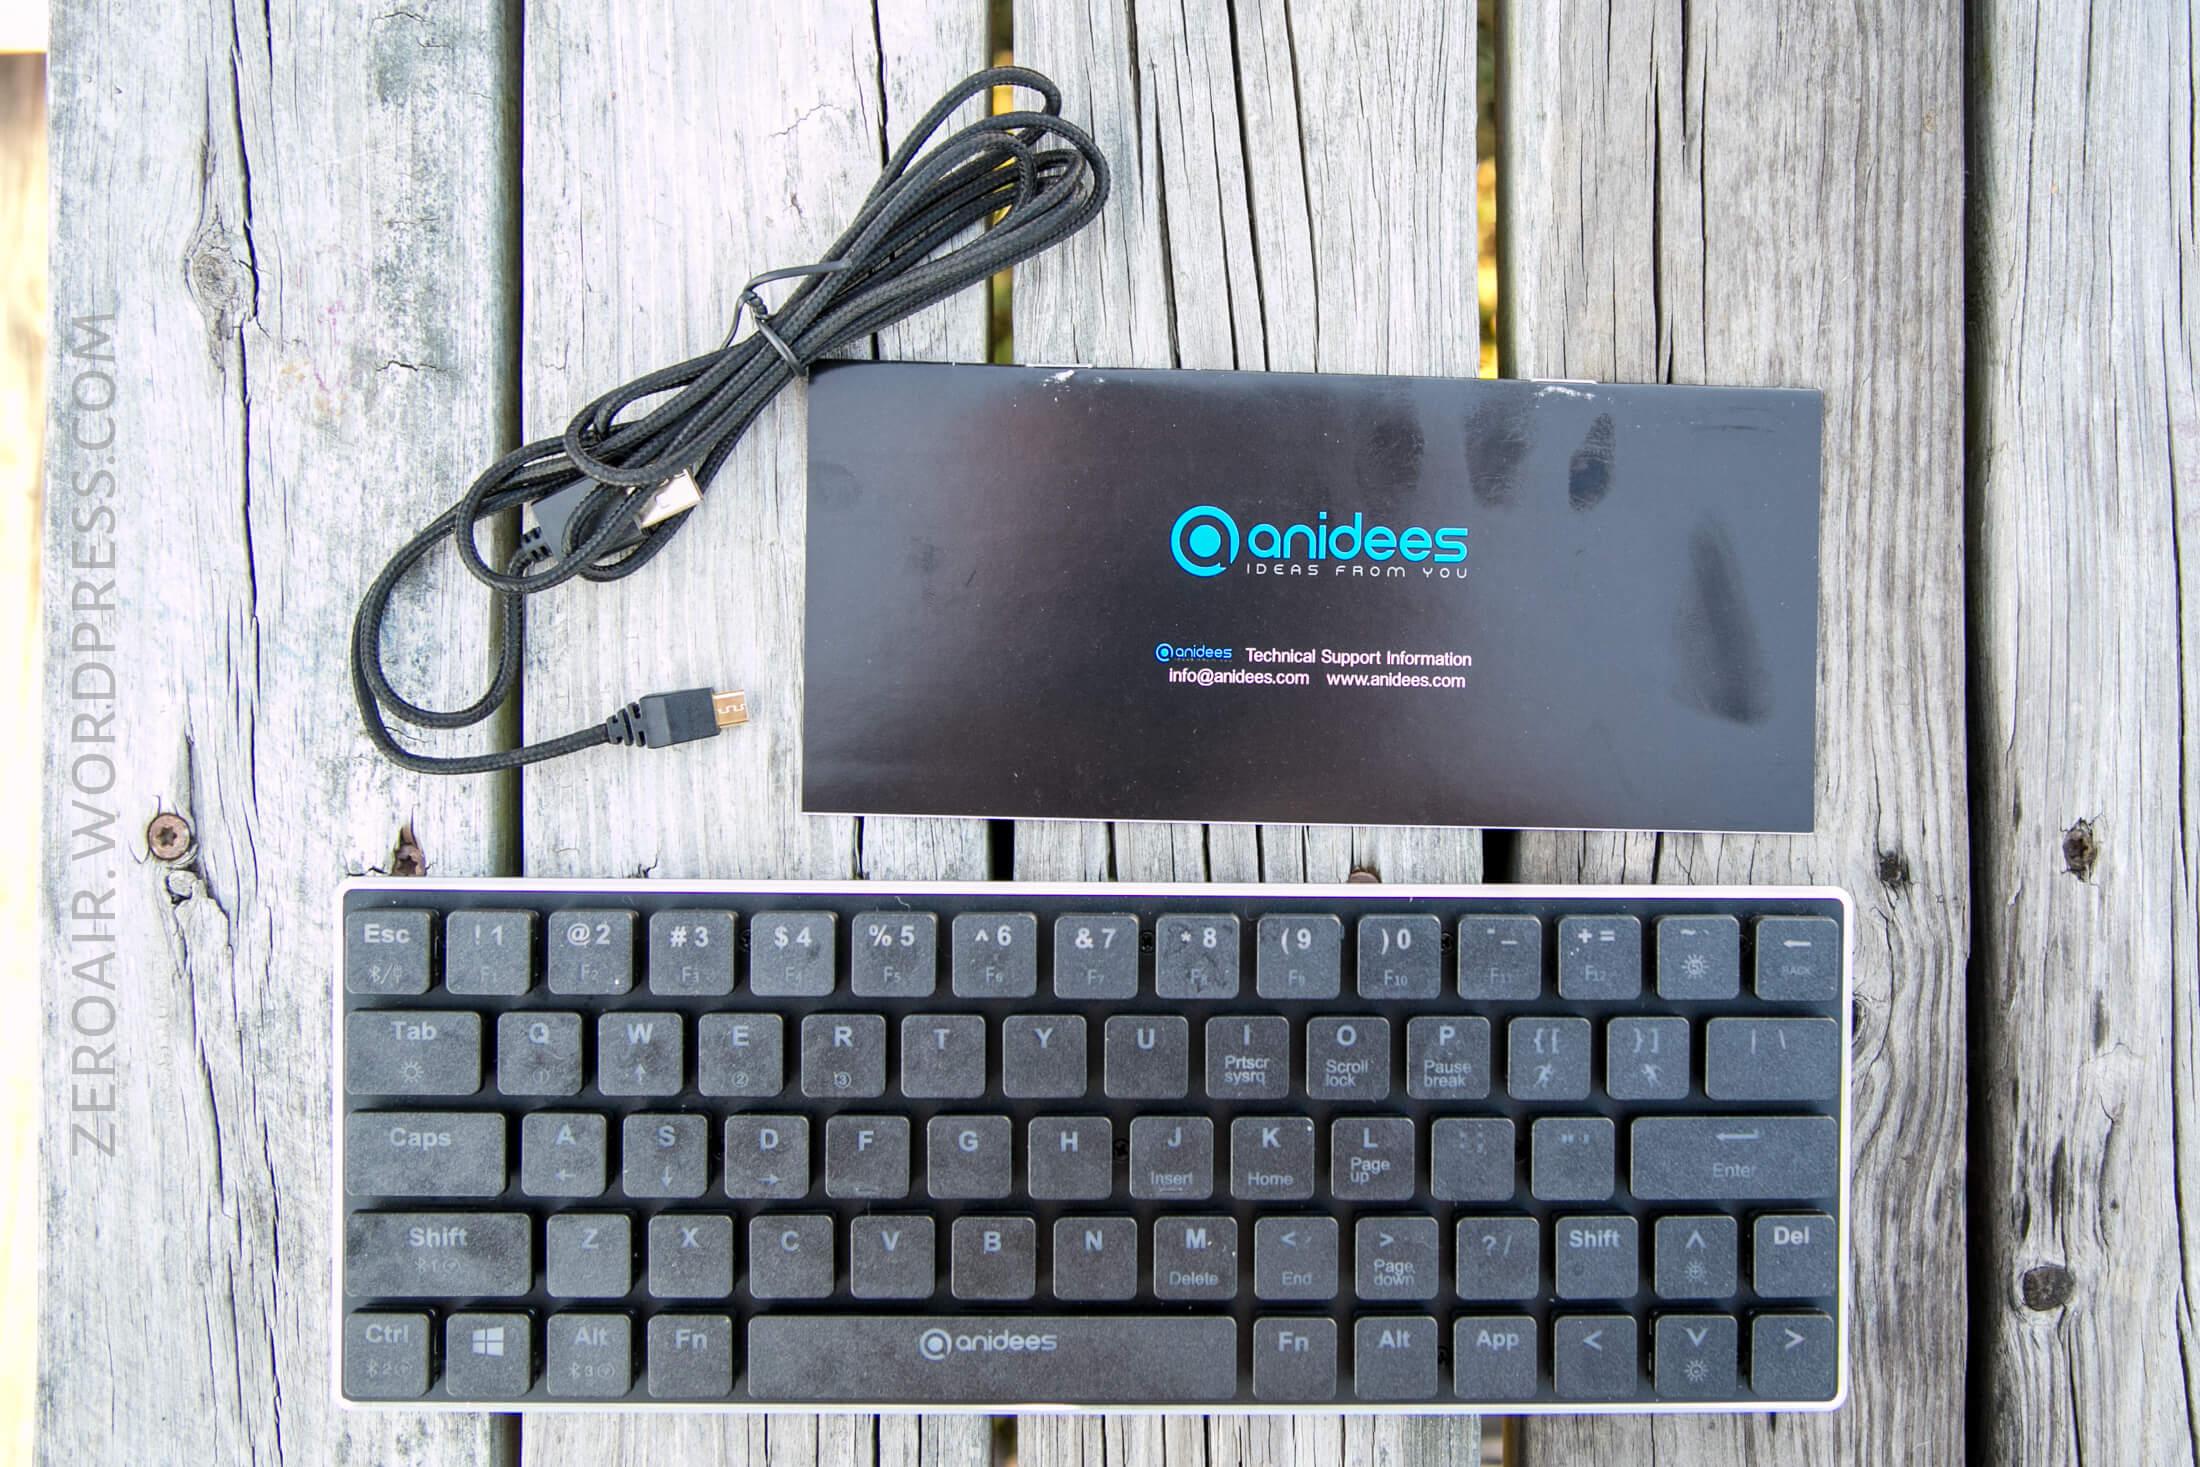 04_zeroair_reviews_anidees_prismatic_mechanical_keyboard.jpg